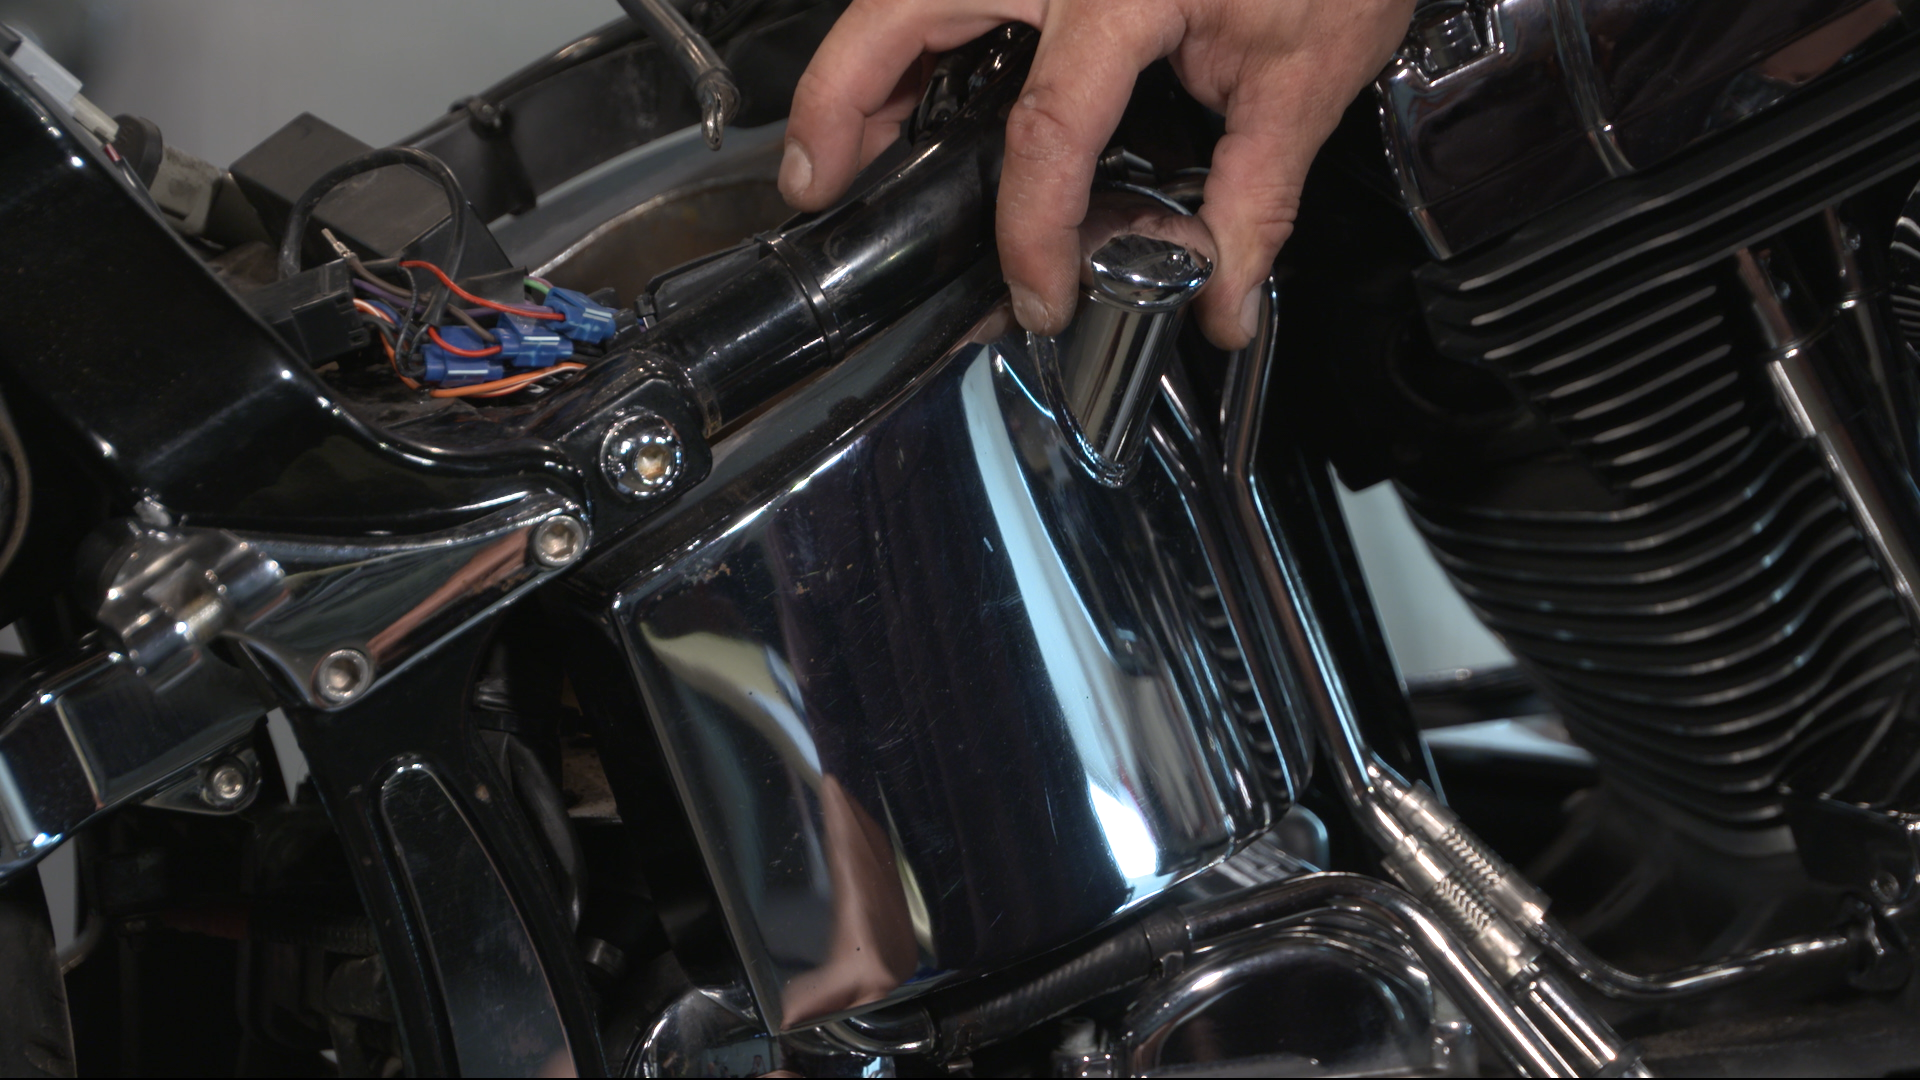 Harley Oil Tank Removal Fix My Hog